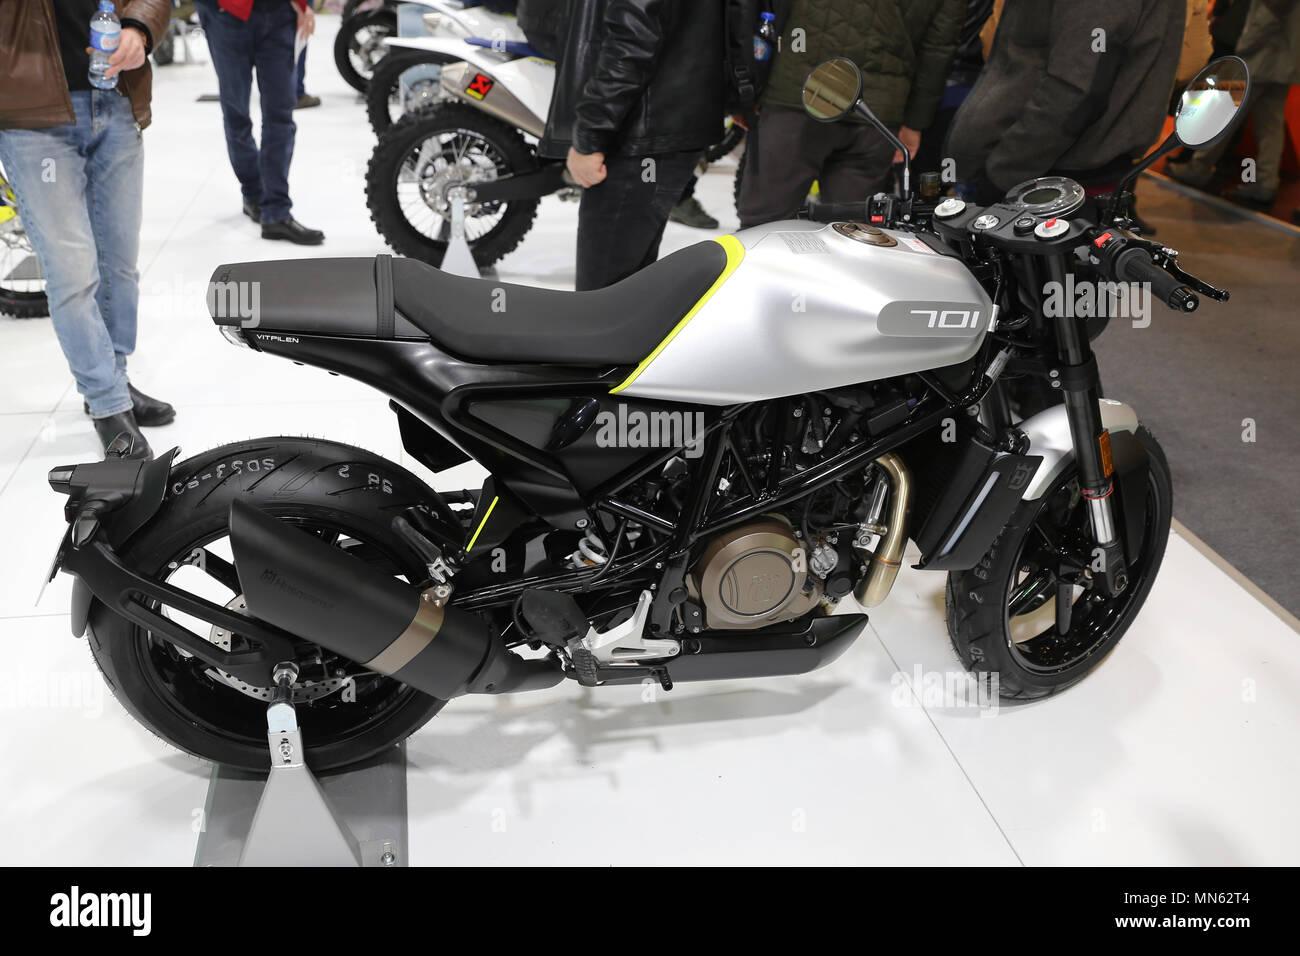 ISTANBUL, TURKEY - FEBRUARY 25, 2018: Husqvarna 701 on display at Motobike Istanbul in Istanbul Exhibition Center - Stock Image